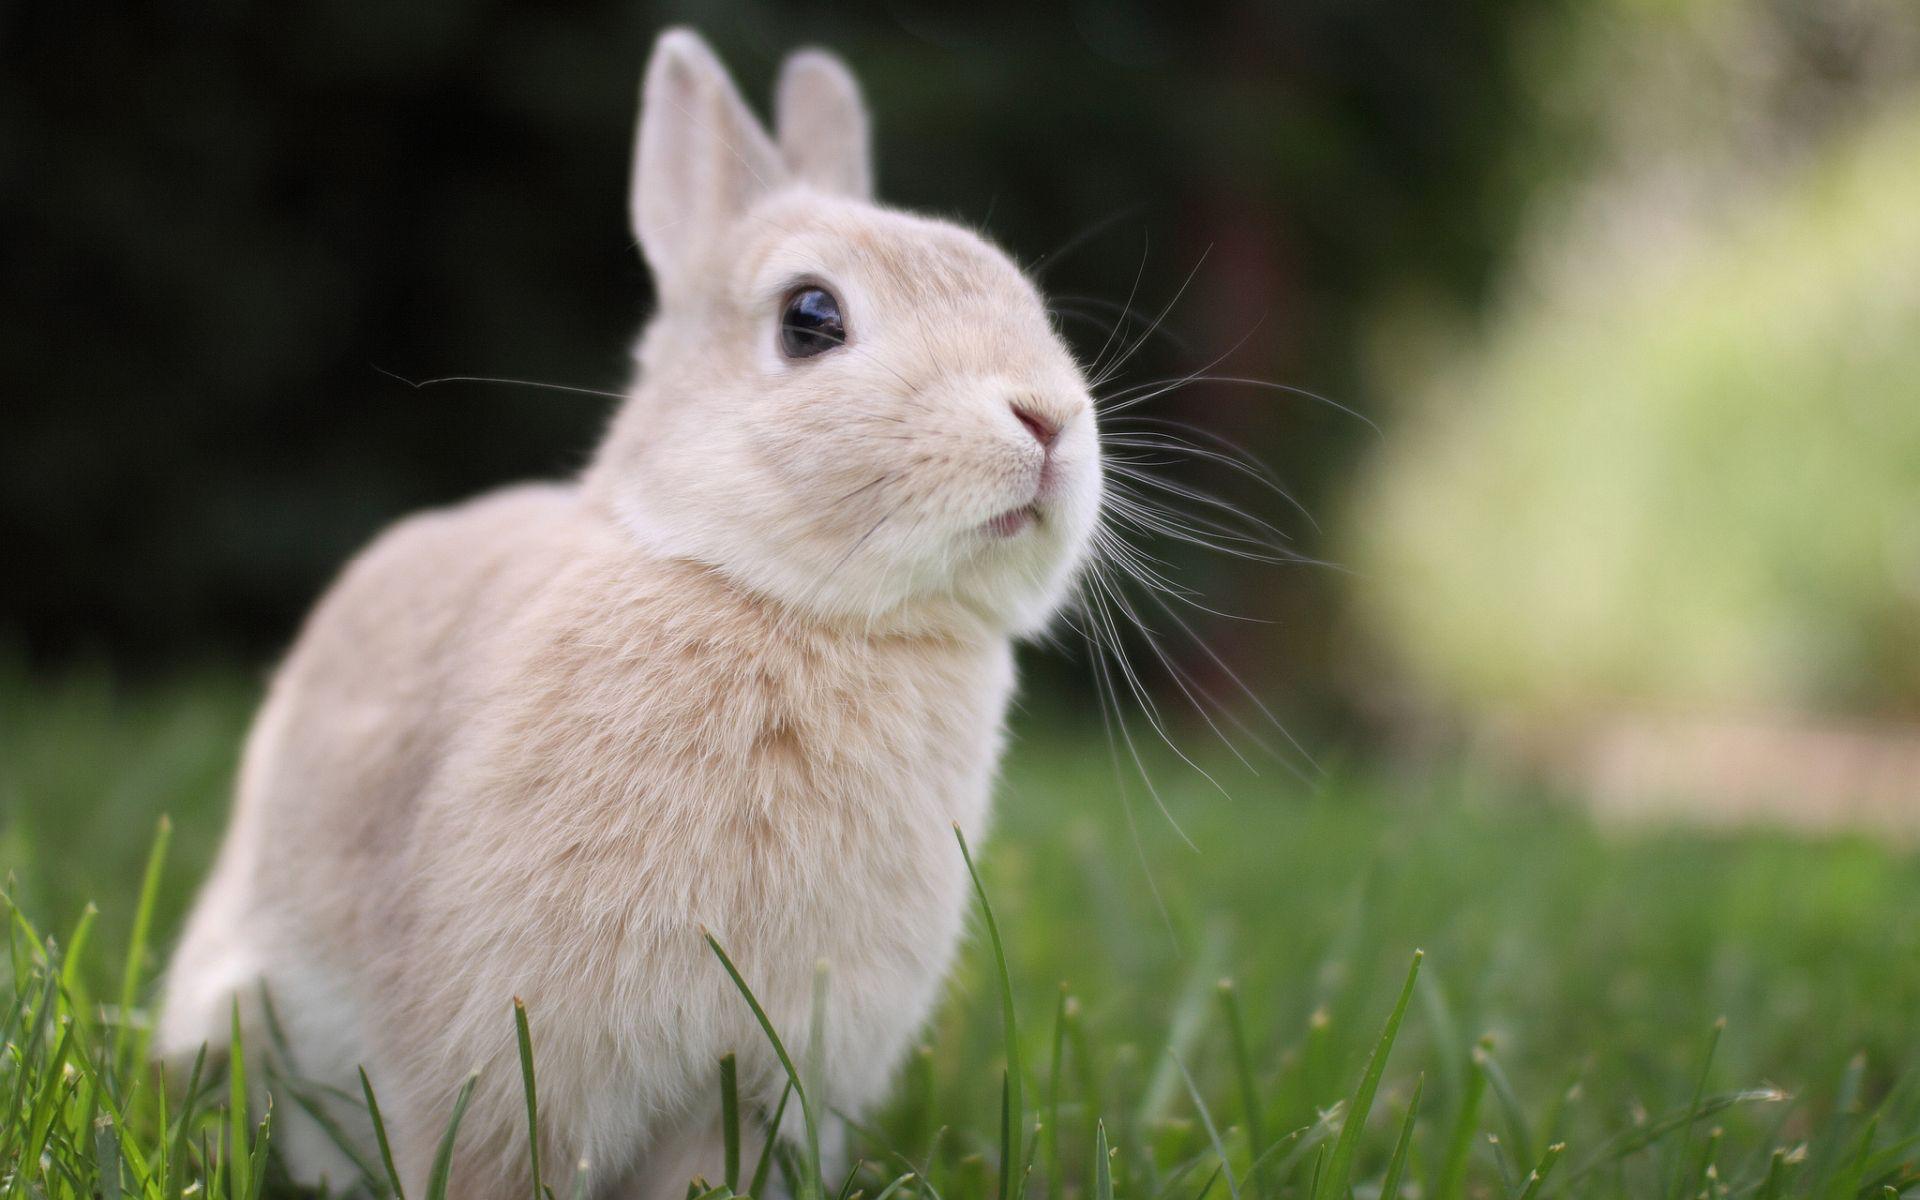 ultra hd cute bunny | ultra hd wallpapers | pinterest | bunny, bun